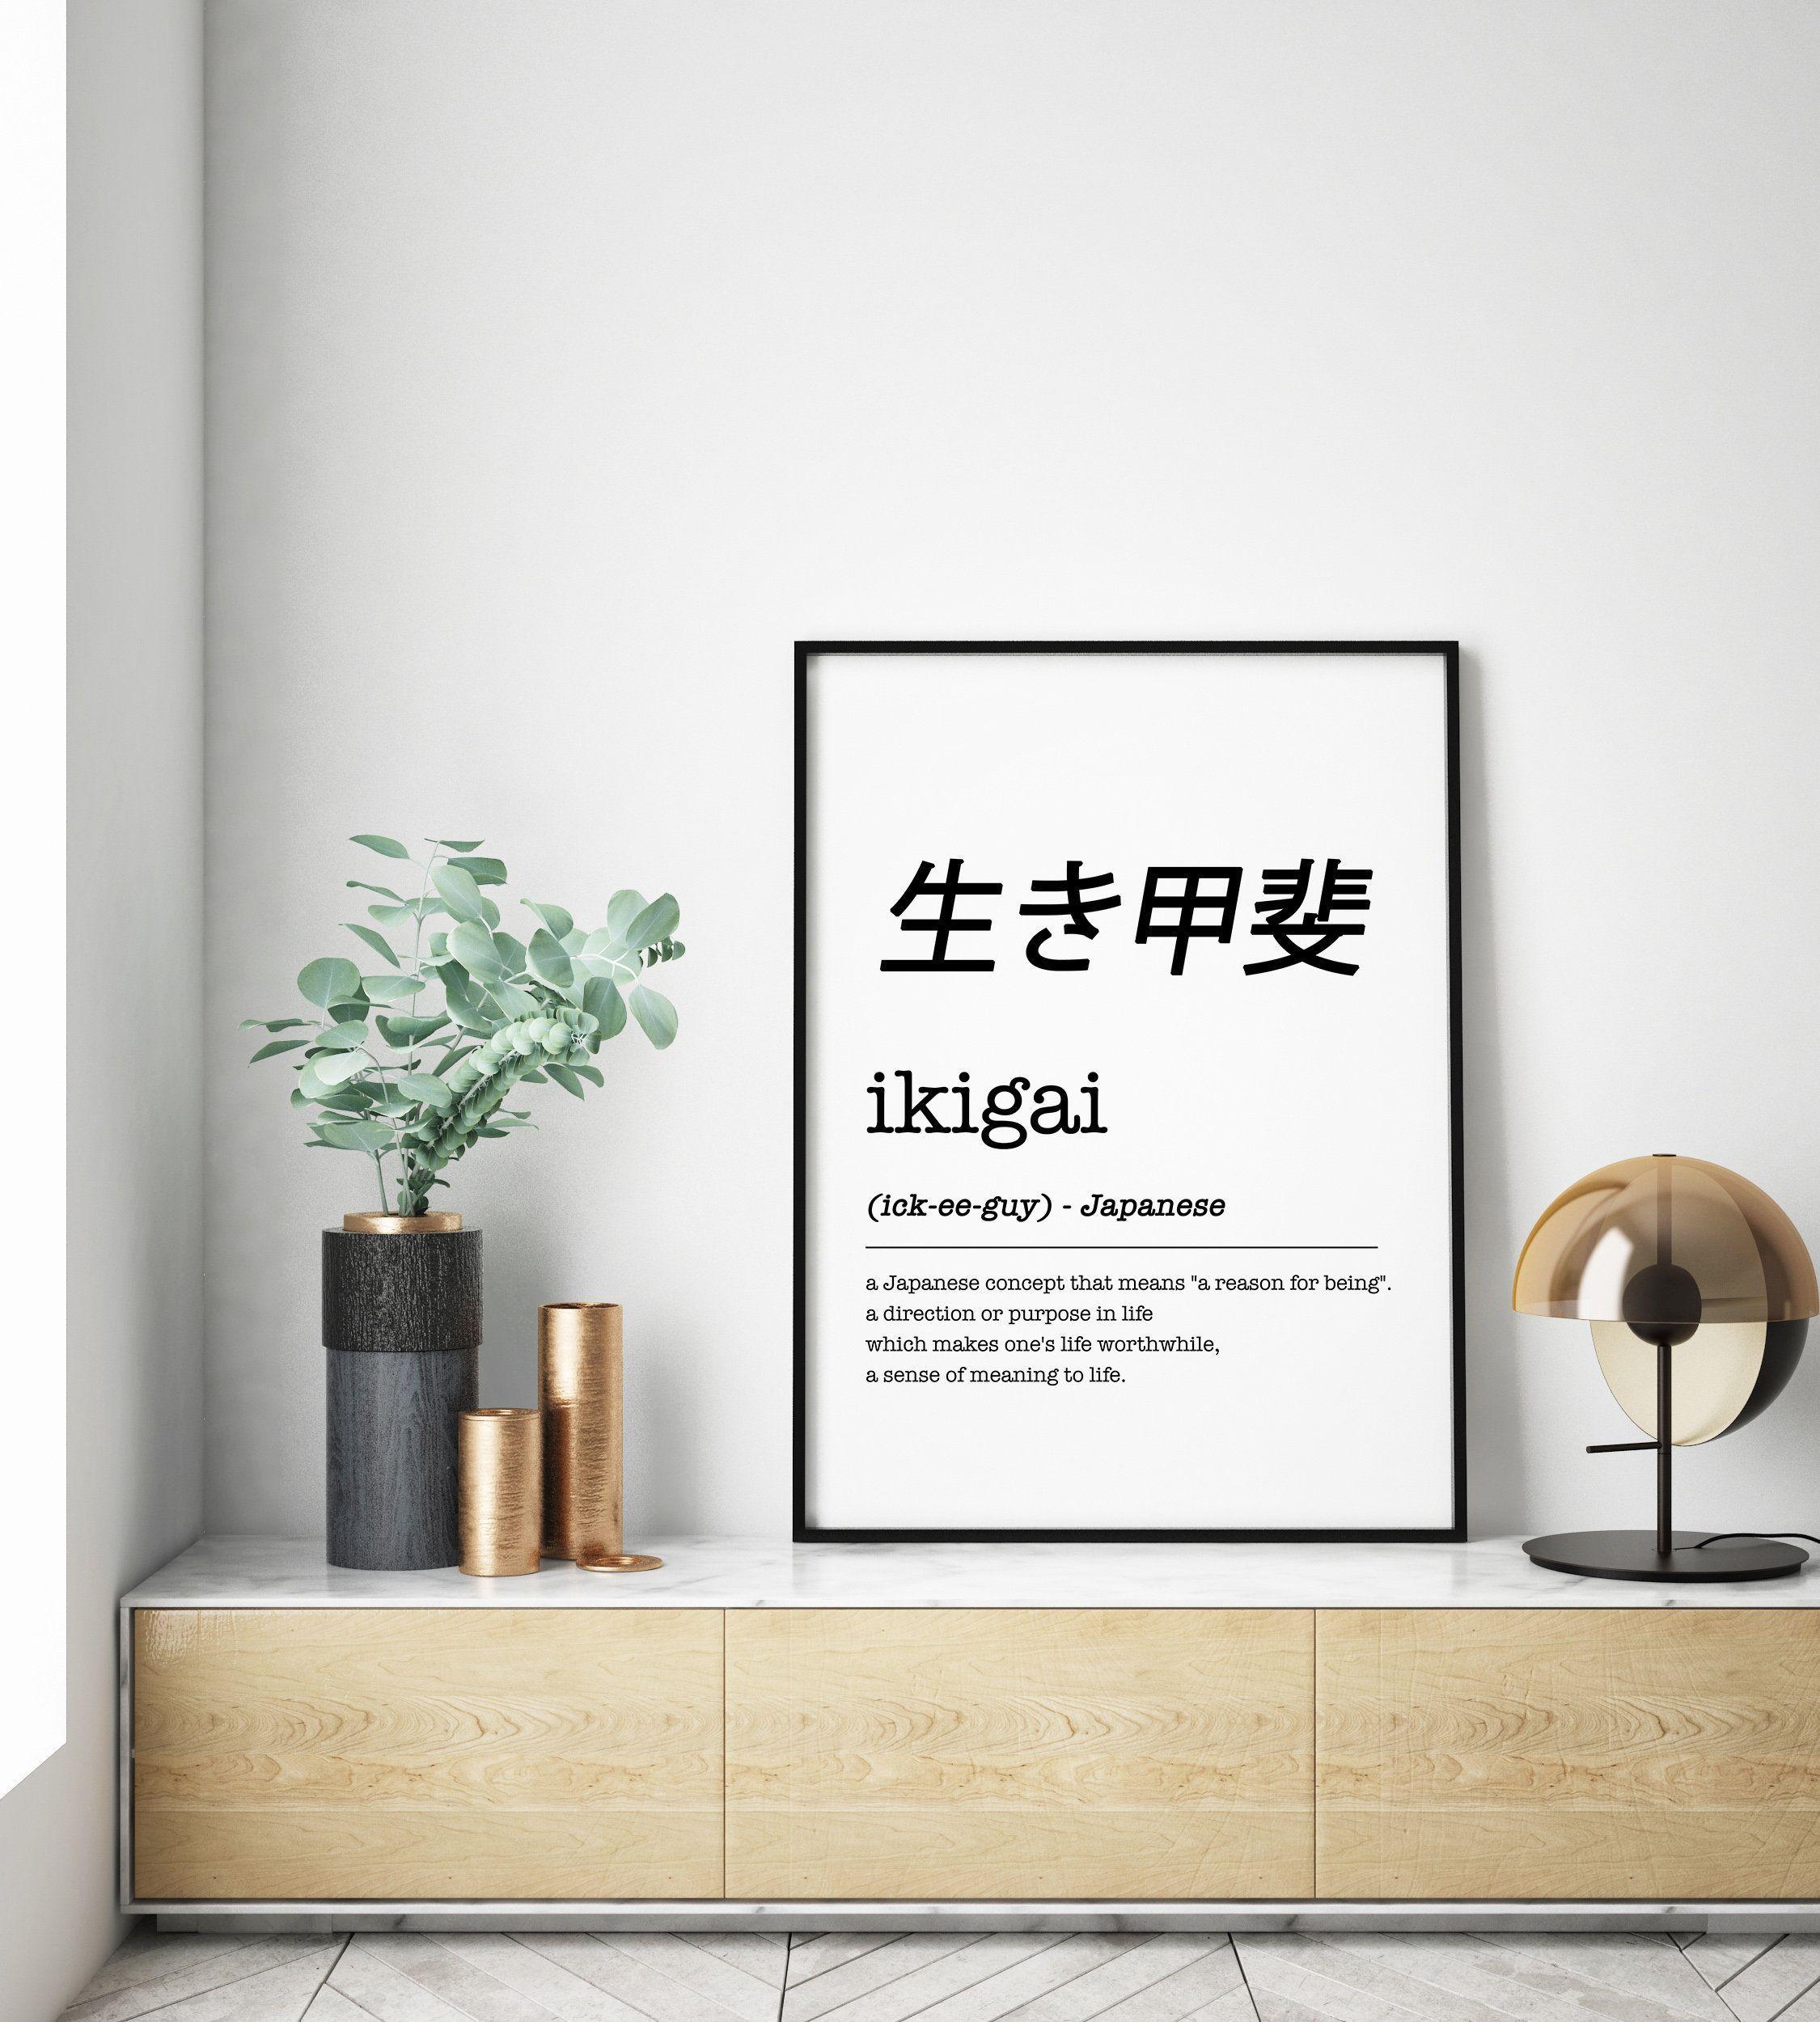 Ikigai Definition Printable Wall Art Japanese Wall Art Etsy In 2020 Wall Printables Printable Wall Art Japanese Wall Art